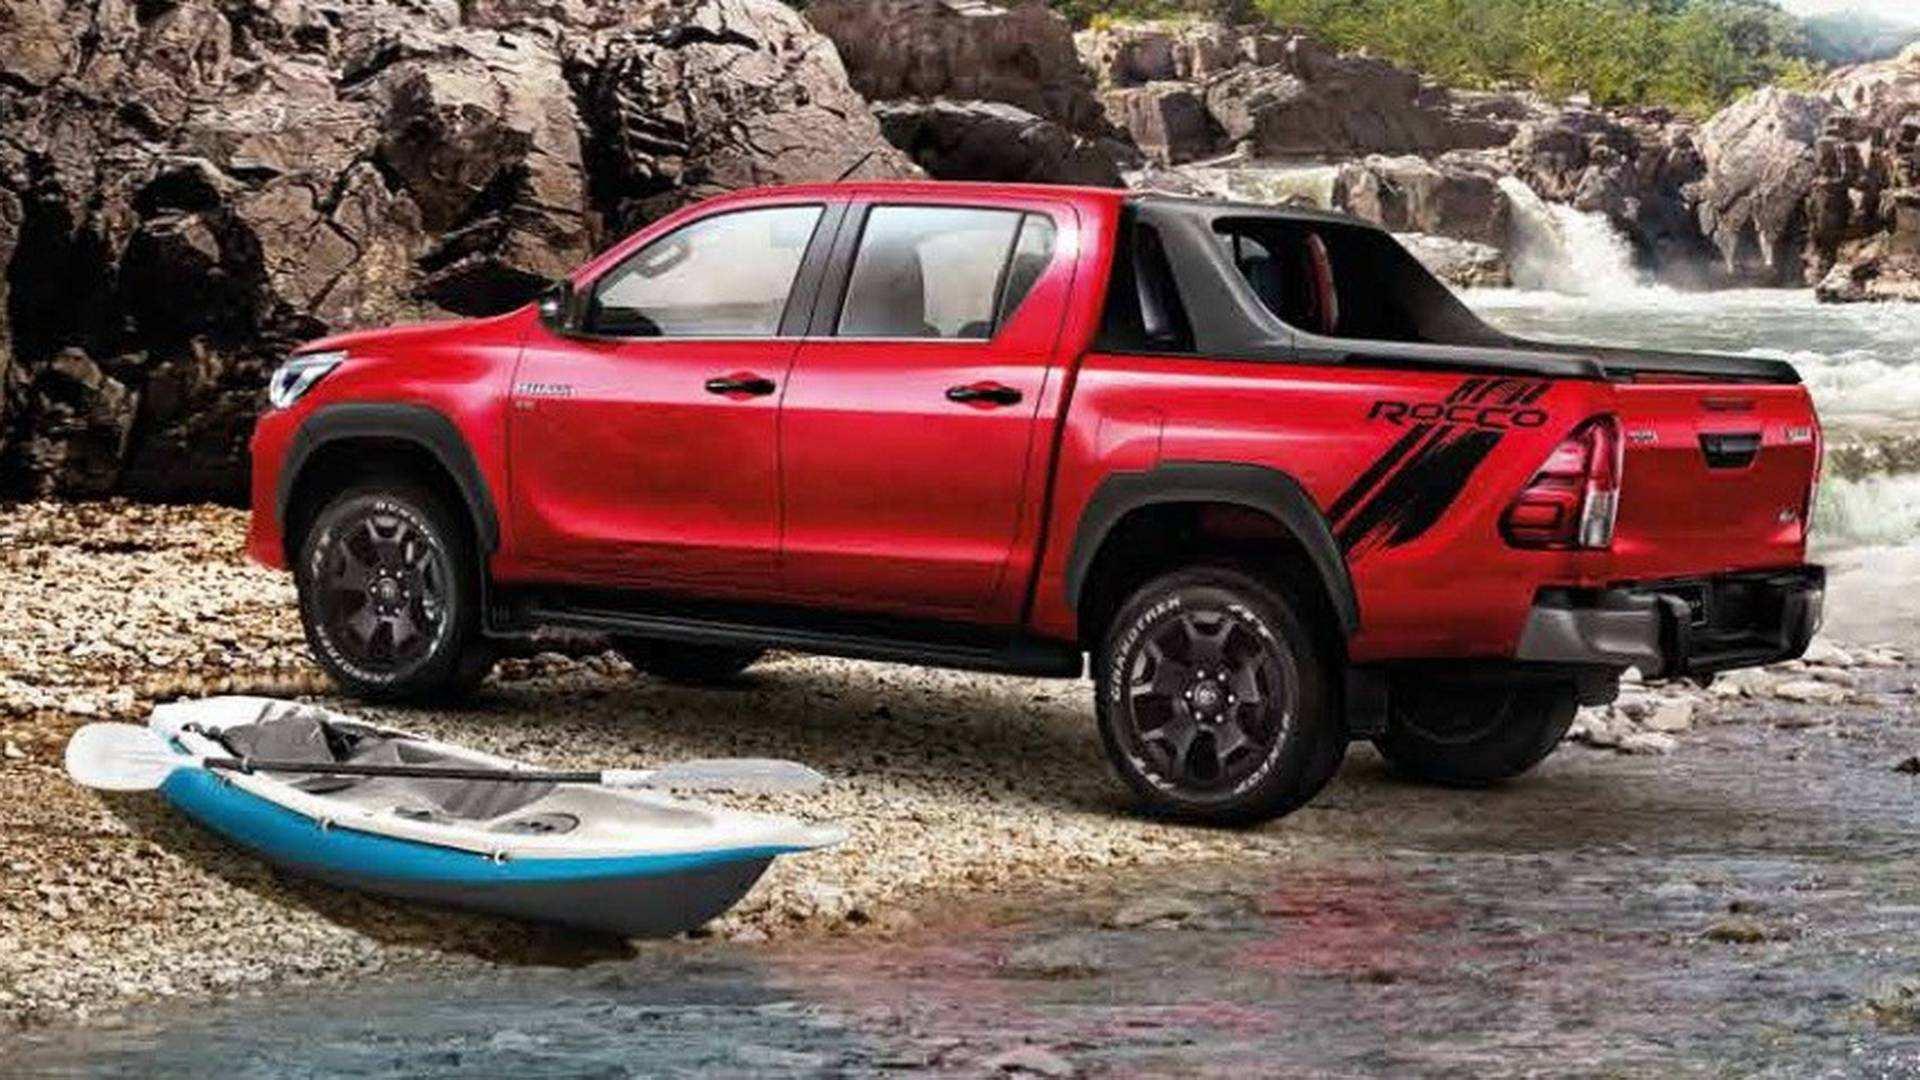 97 Concept of Toyota Dakar 2020 Reviews by Toyota Dakar 2020